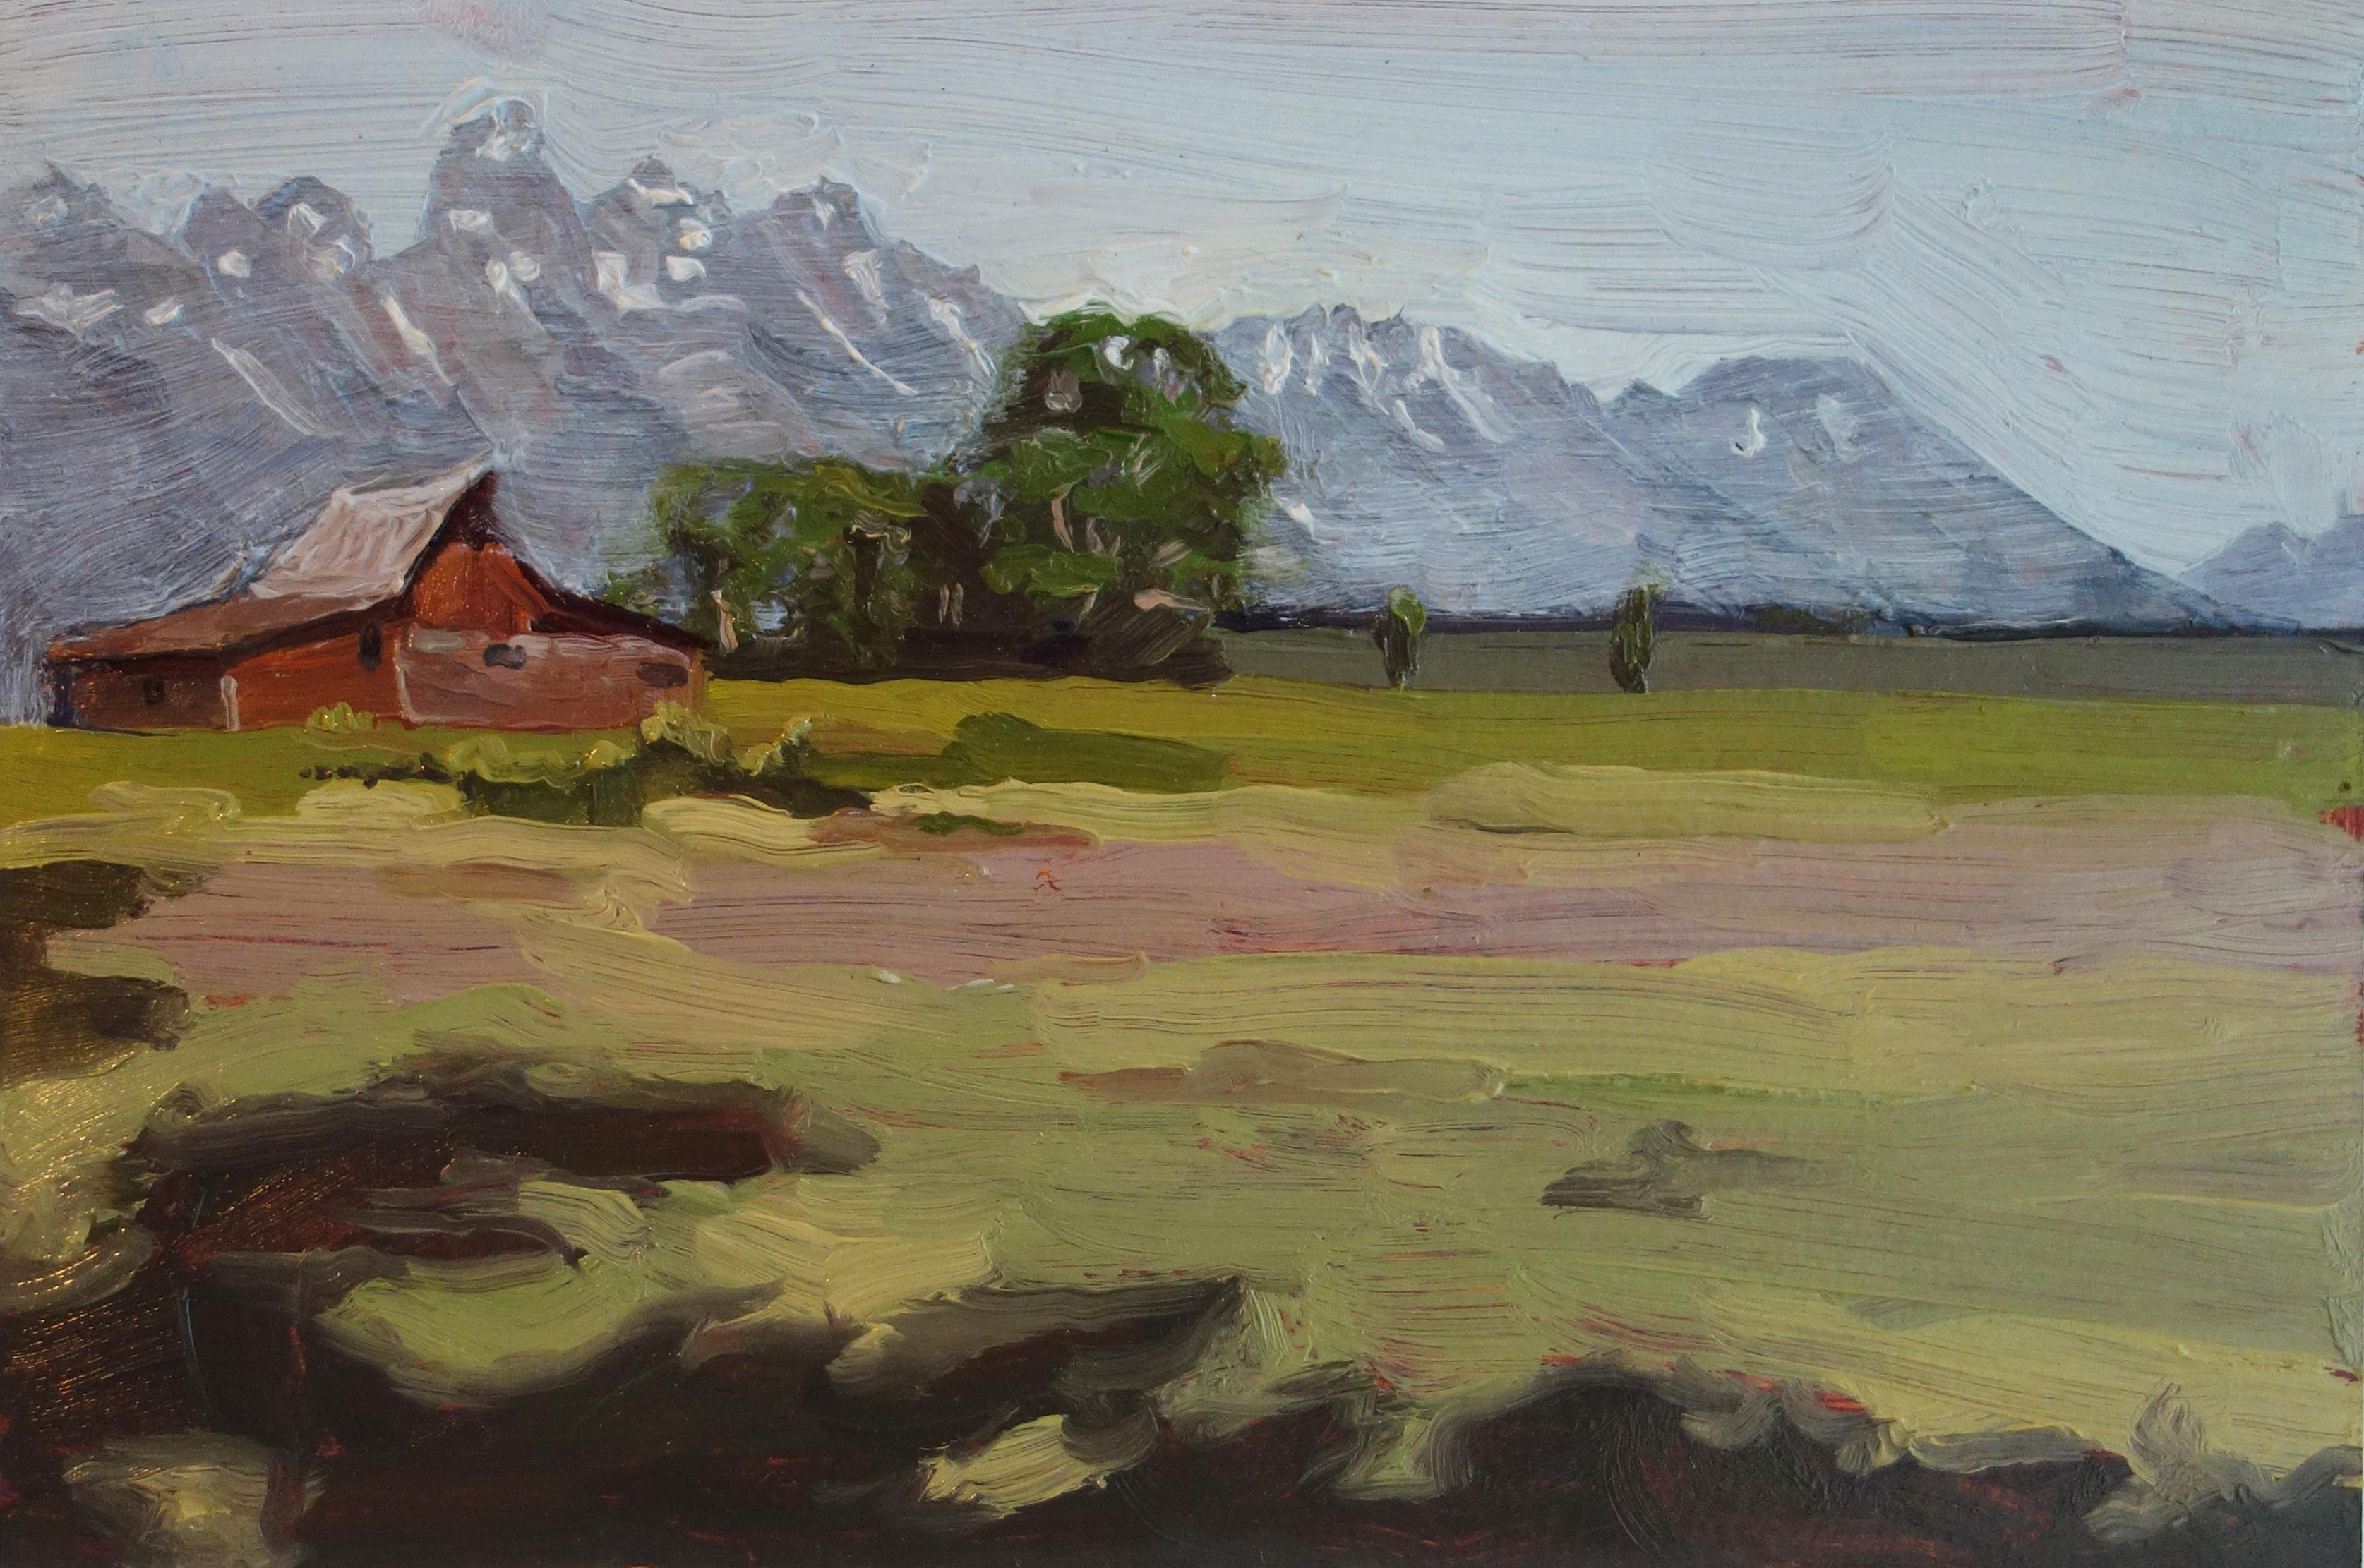 Mormon_Barn_Jackson_Hole_WY_Oil_on_Paper_Painting_9x6_Maud_Taber_Thomas_Washington_DC_Georgetown